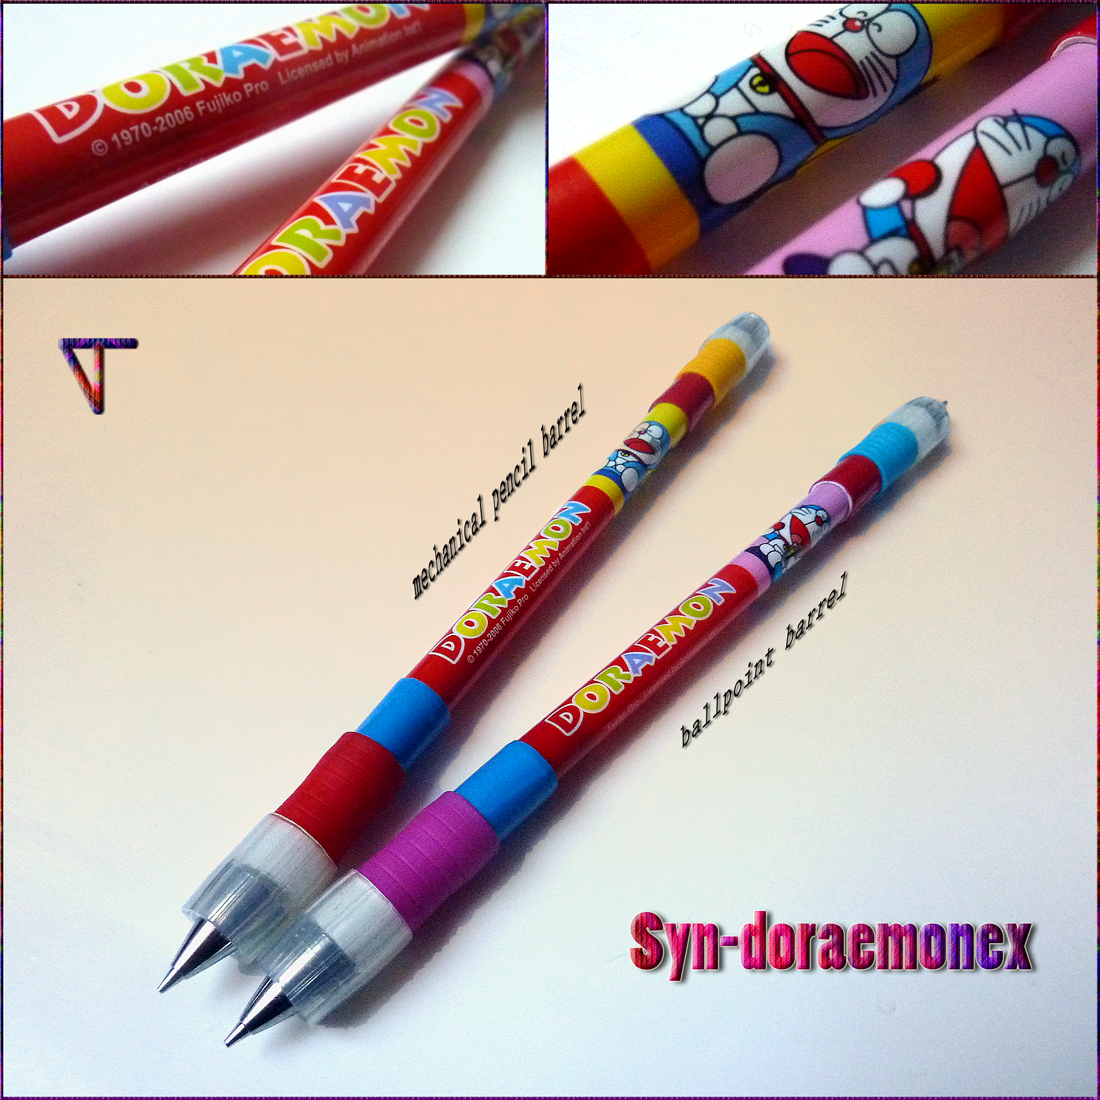 SYN-DORAEMONEX